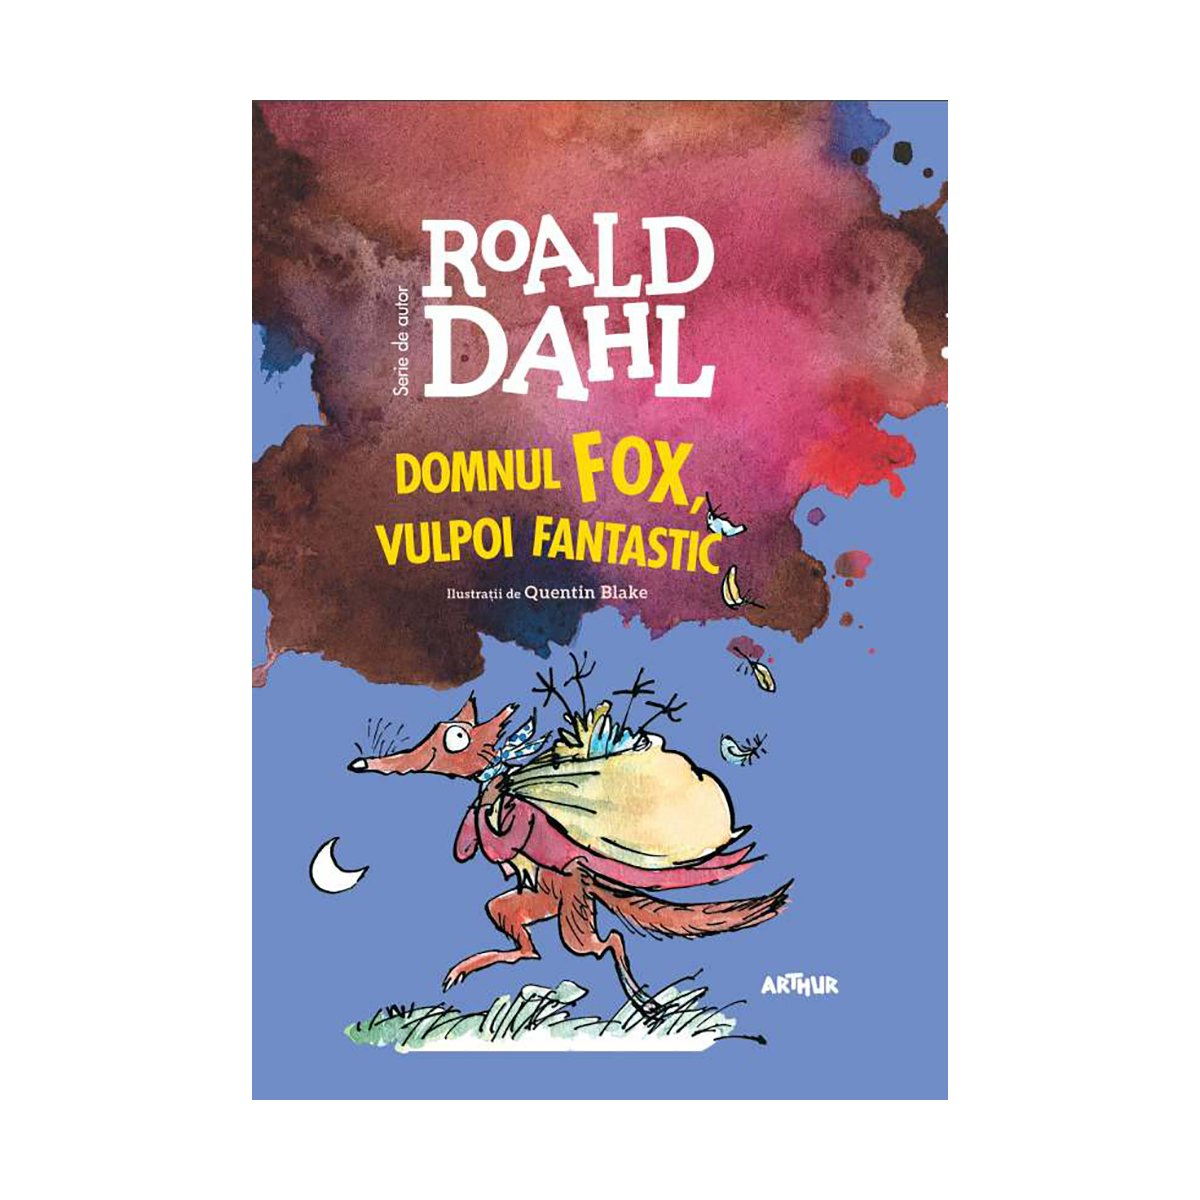 Carte Editura Arthur, Domul Fox, vulpoi fantastic, Roald Dahl